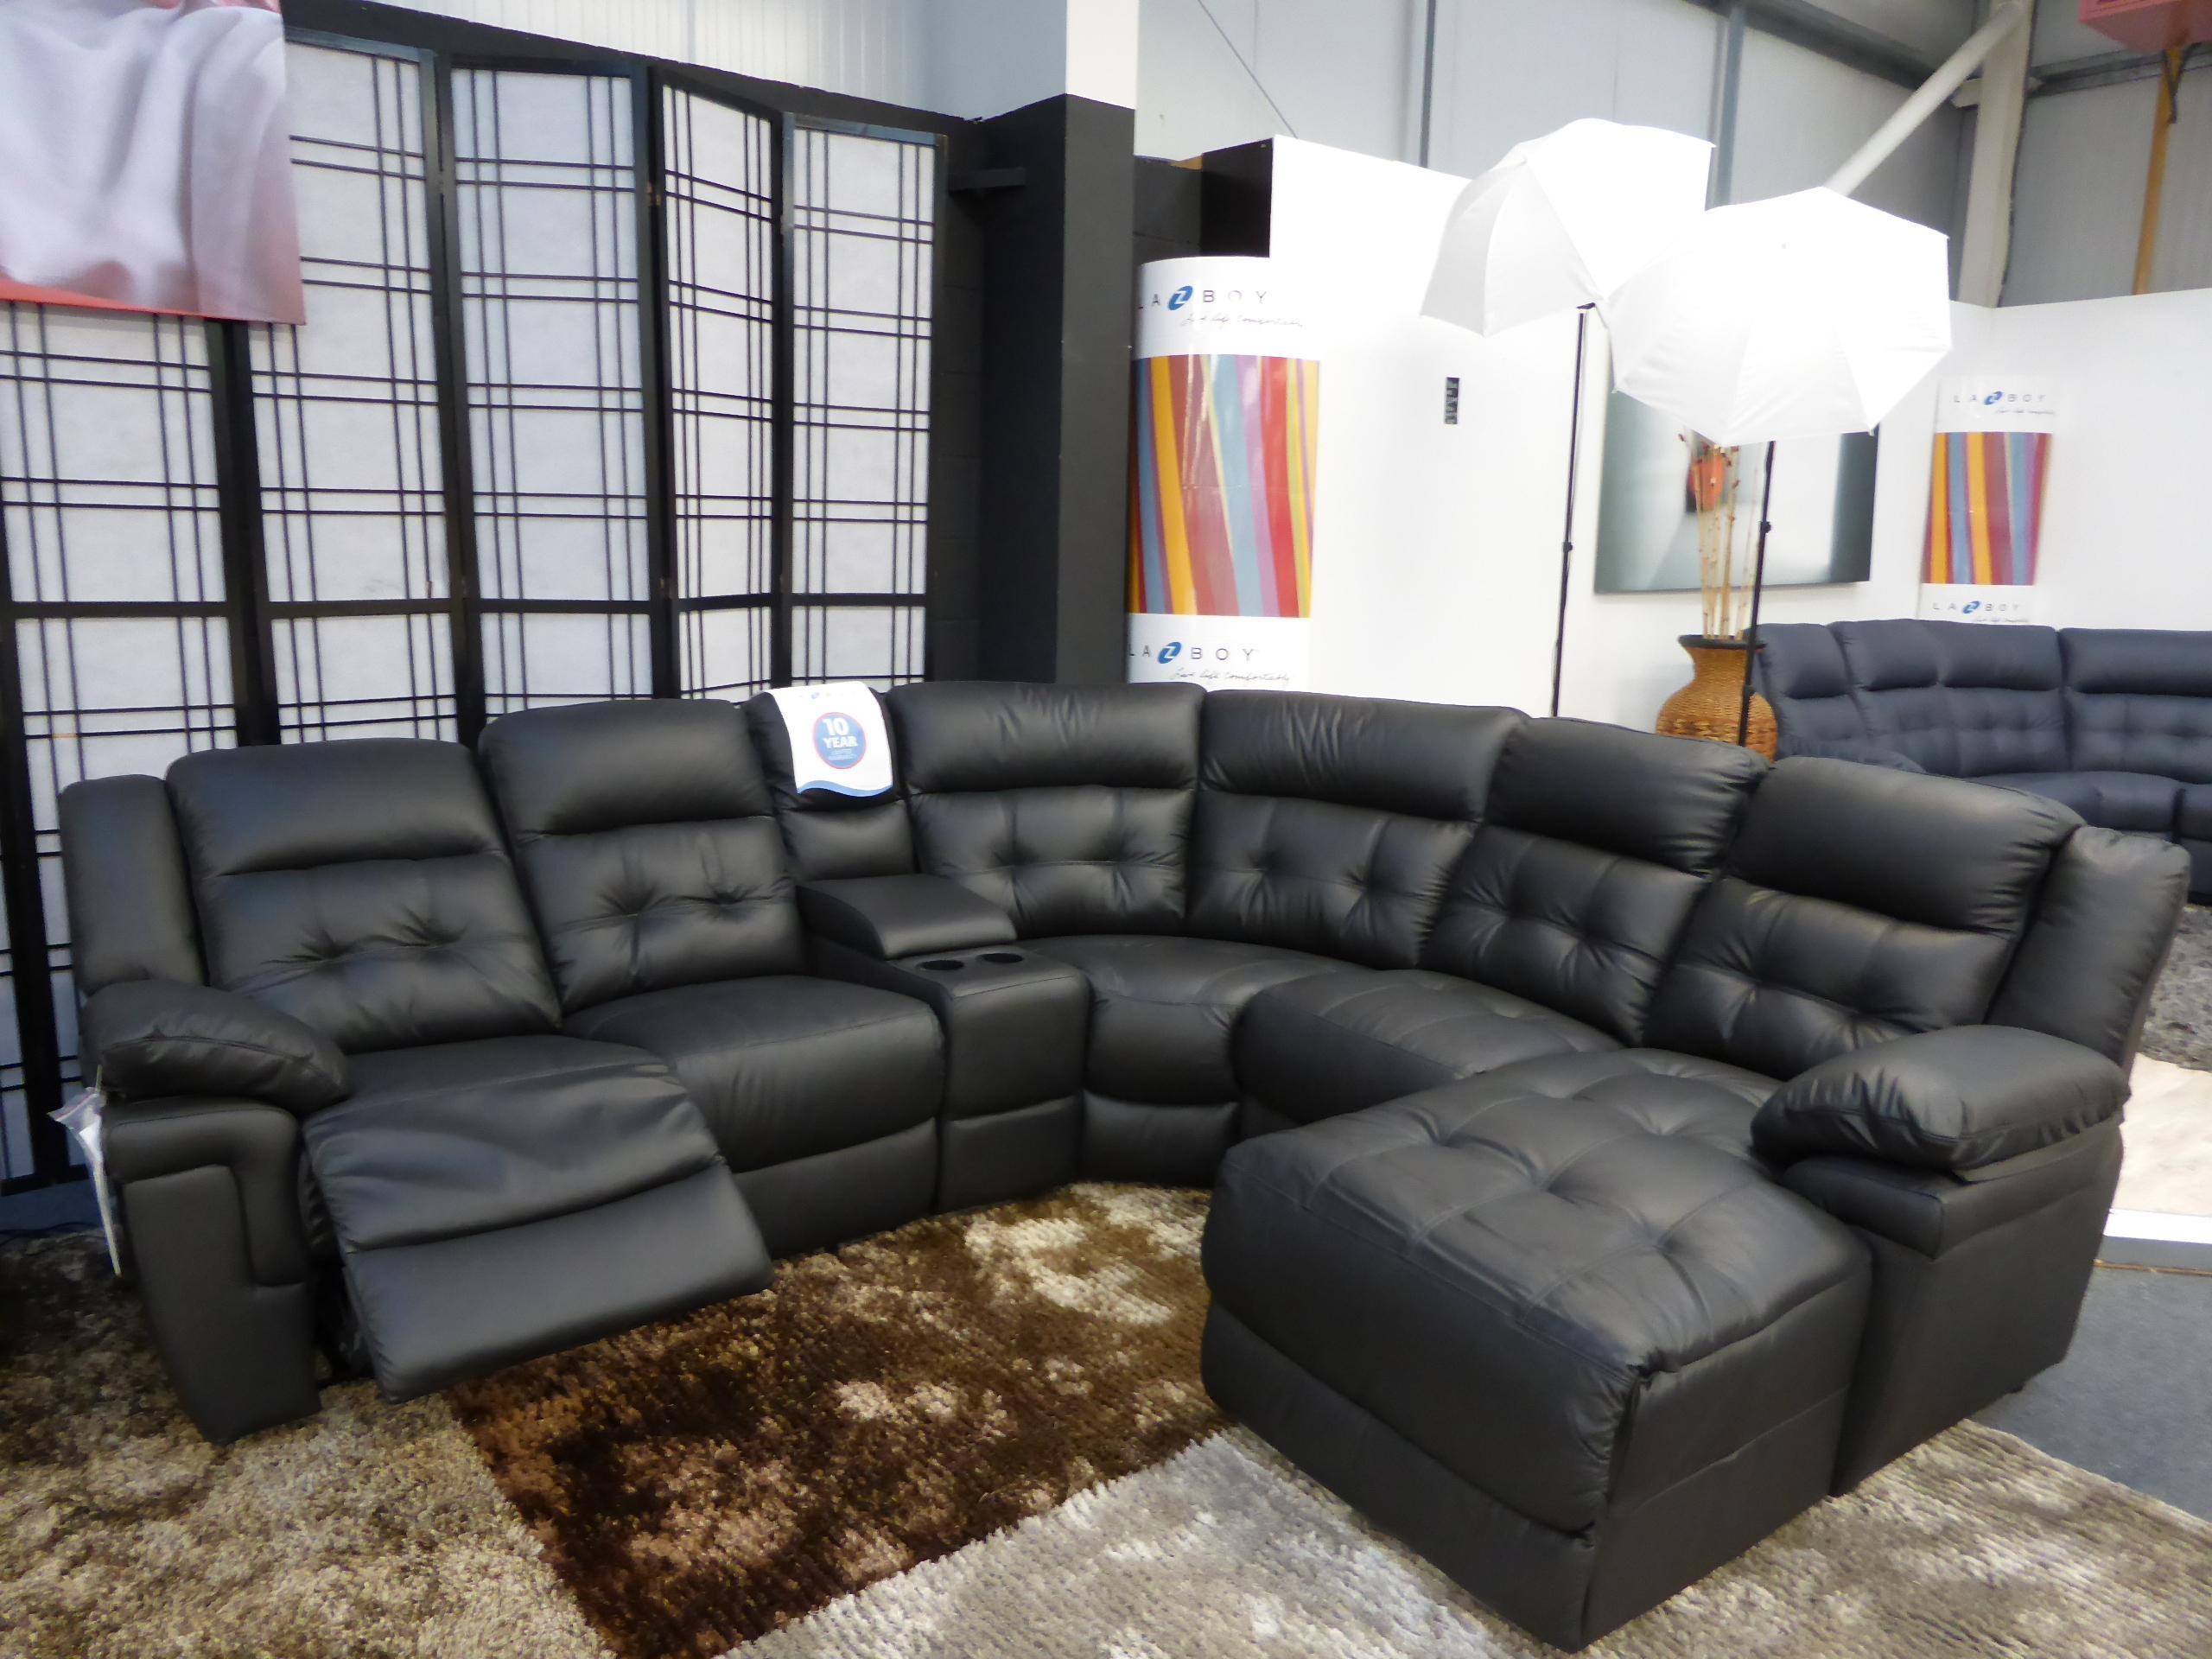 Lazy Boy Sofa Recliners Prices | Tehranmix Decoration Inside Lazy Boy Manhattan Sofas (View 20 of 21)